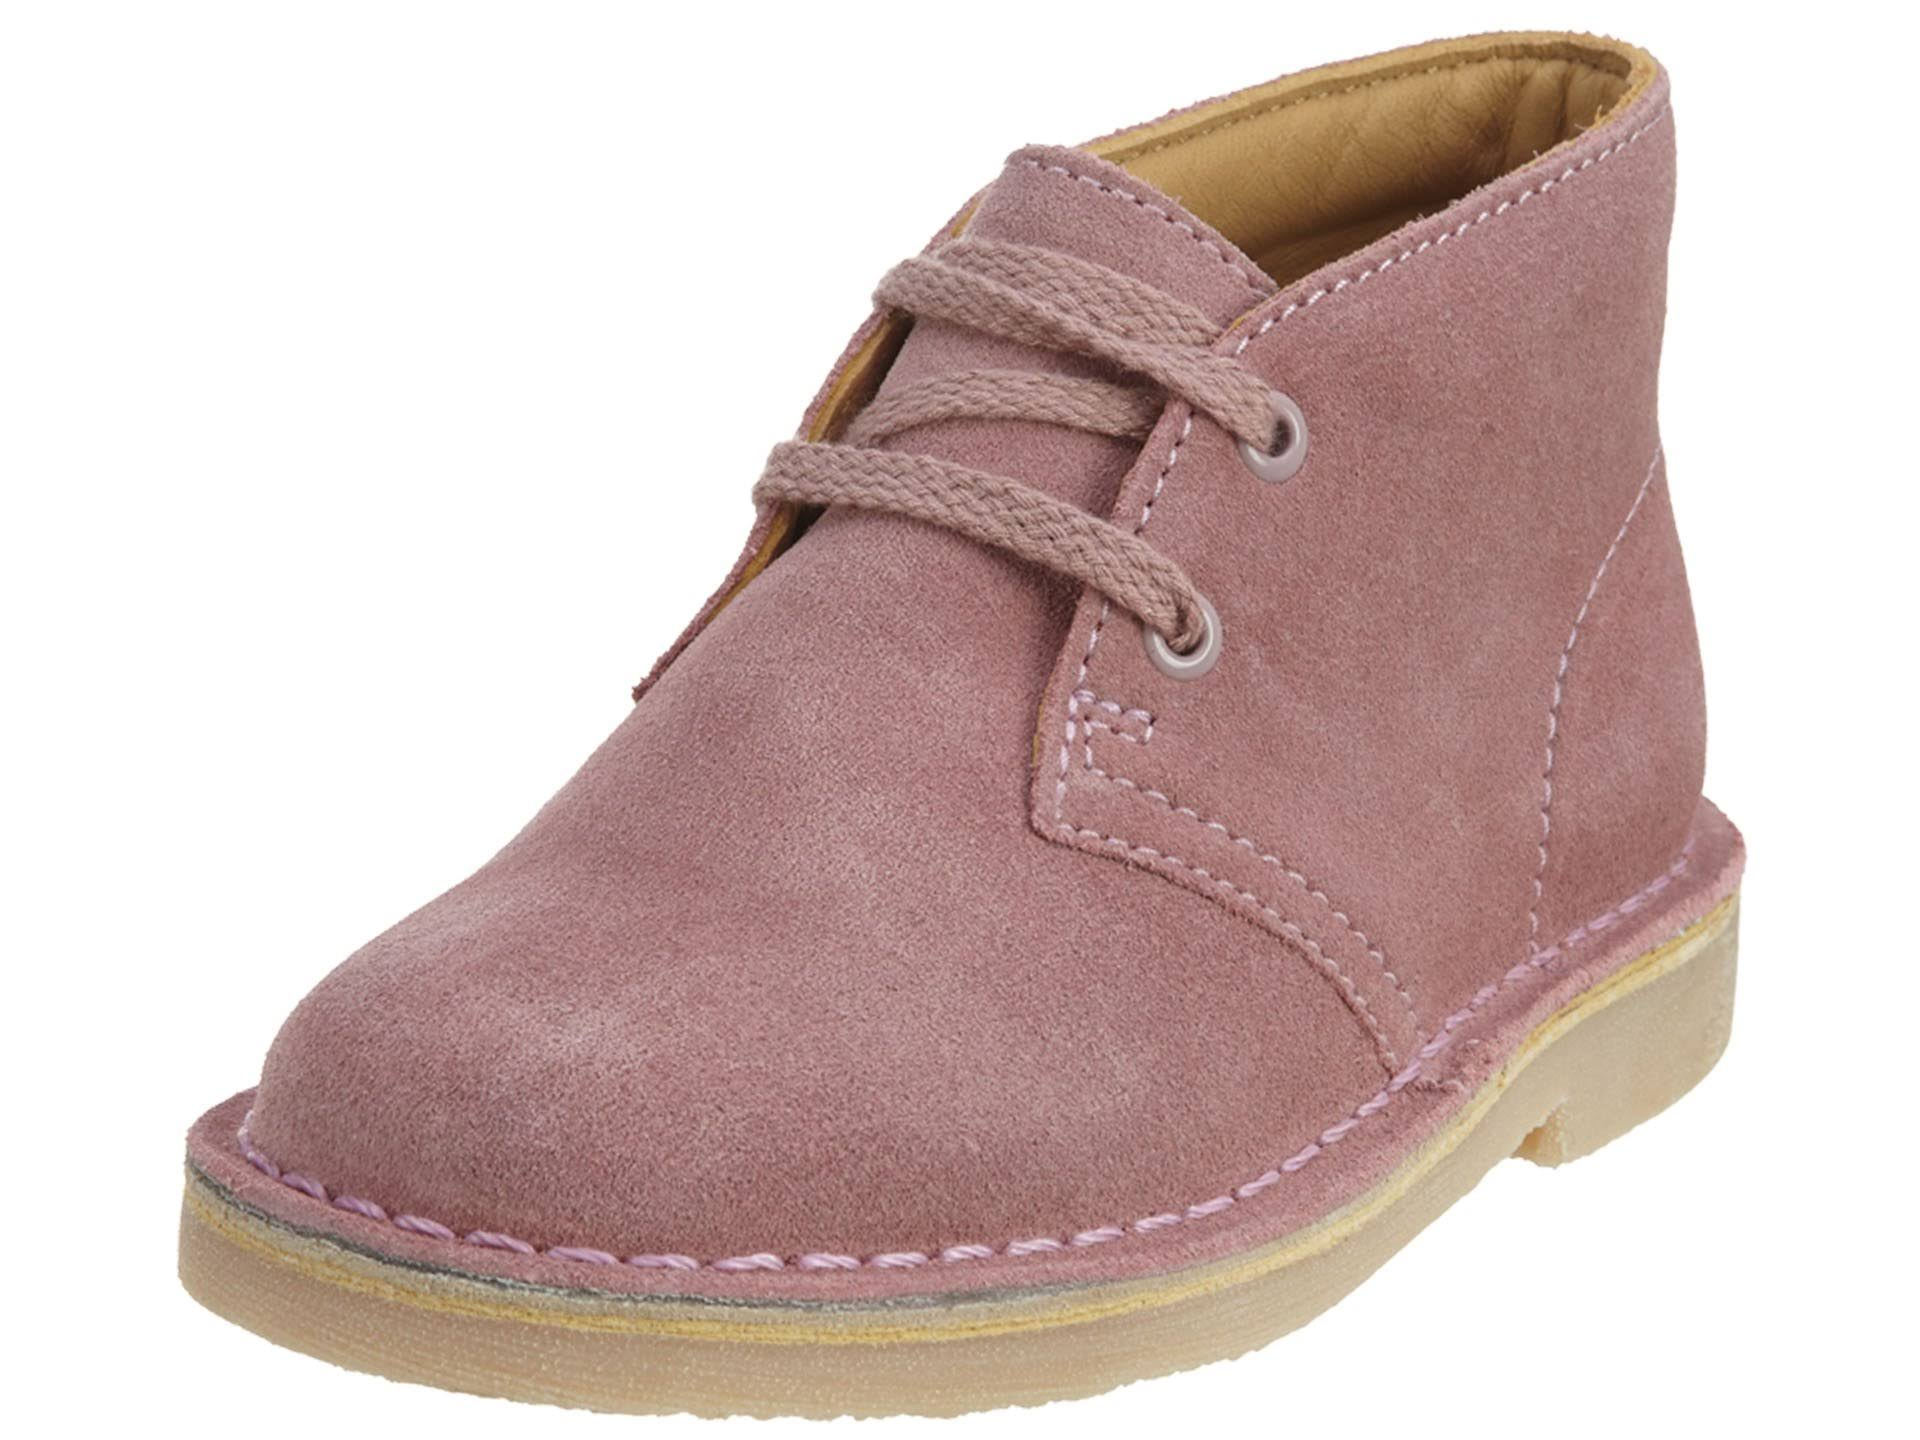 Rose6 Boot Fs Pink Tg Toddlers Clarks Desert 5 Stijl26110517Vintage tQrdCxhs